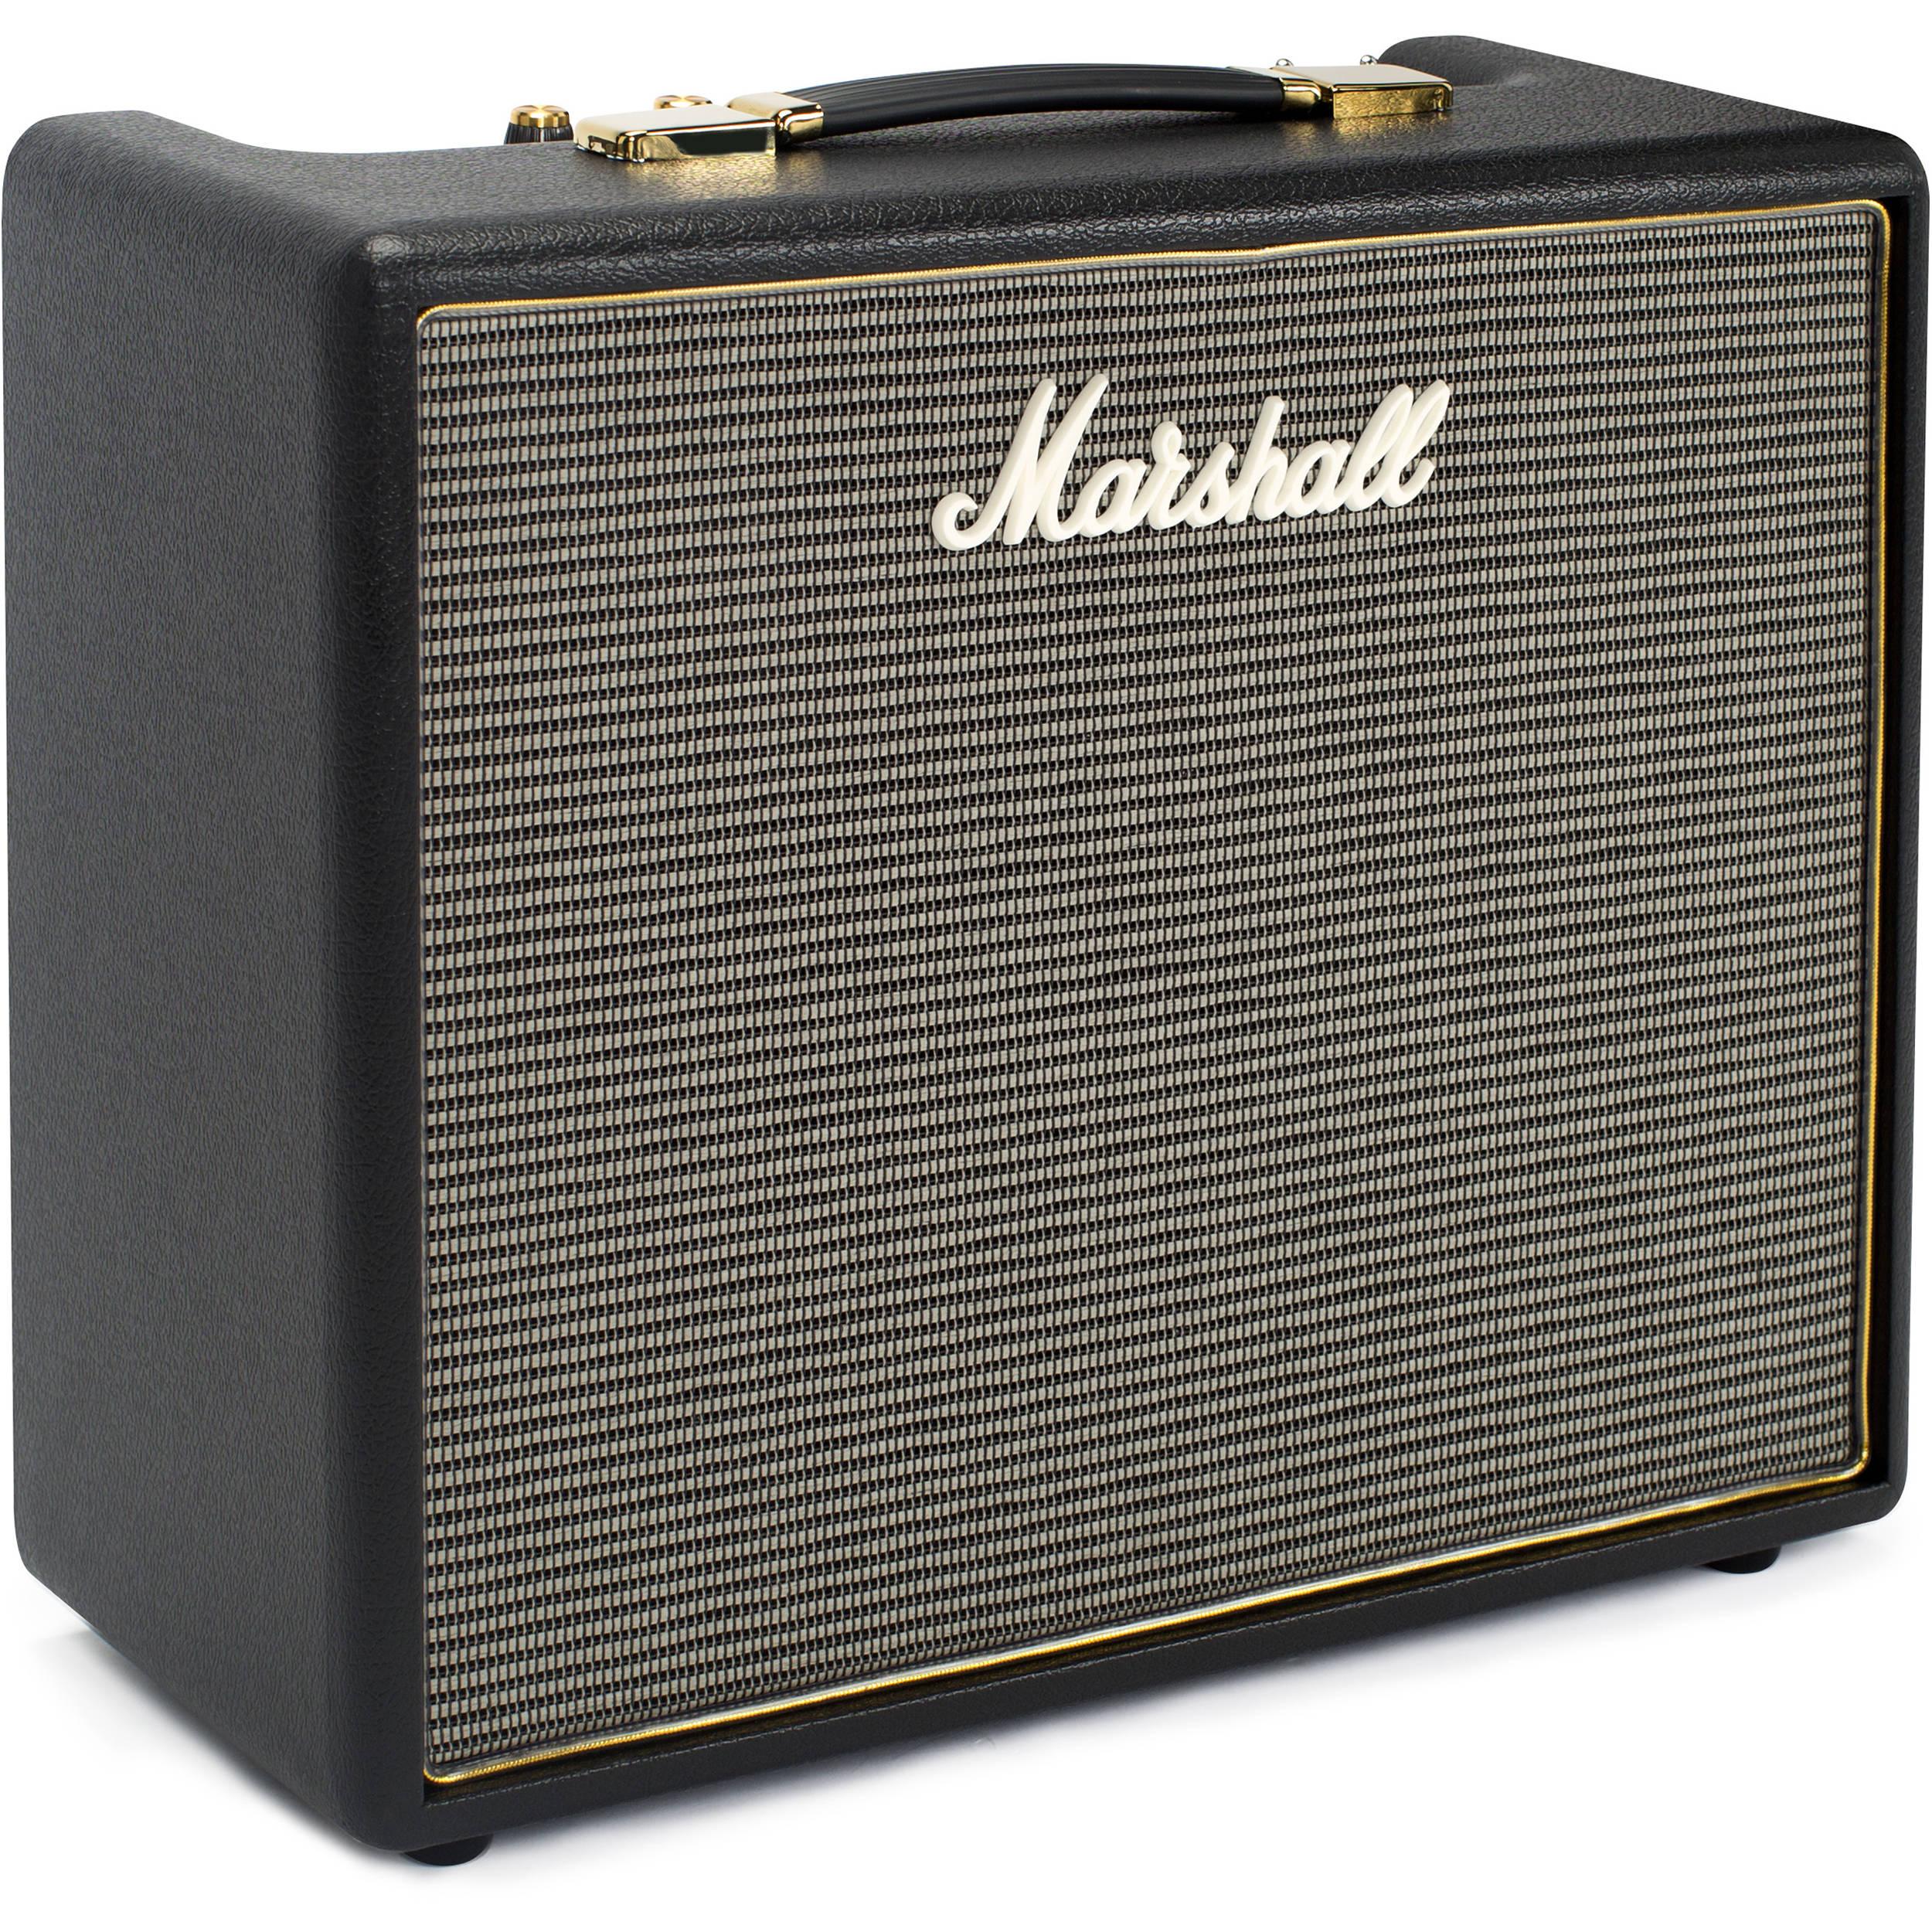 marshall amplification origin 5 5w 1x8 combo amplifier m ori5c u. Black Bedroom Furniture Sets. Home Design Ideas